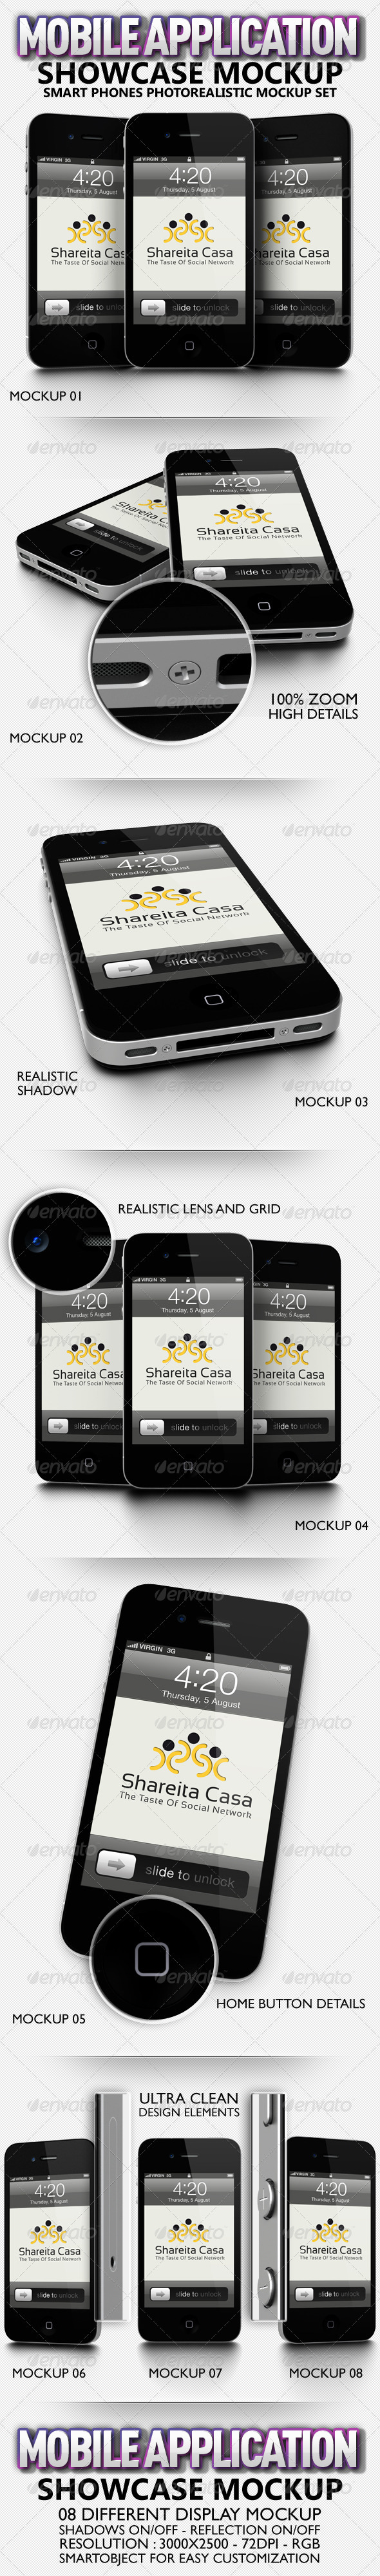 Mobile Application Showcase Mockup - Mobile Displays